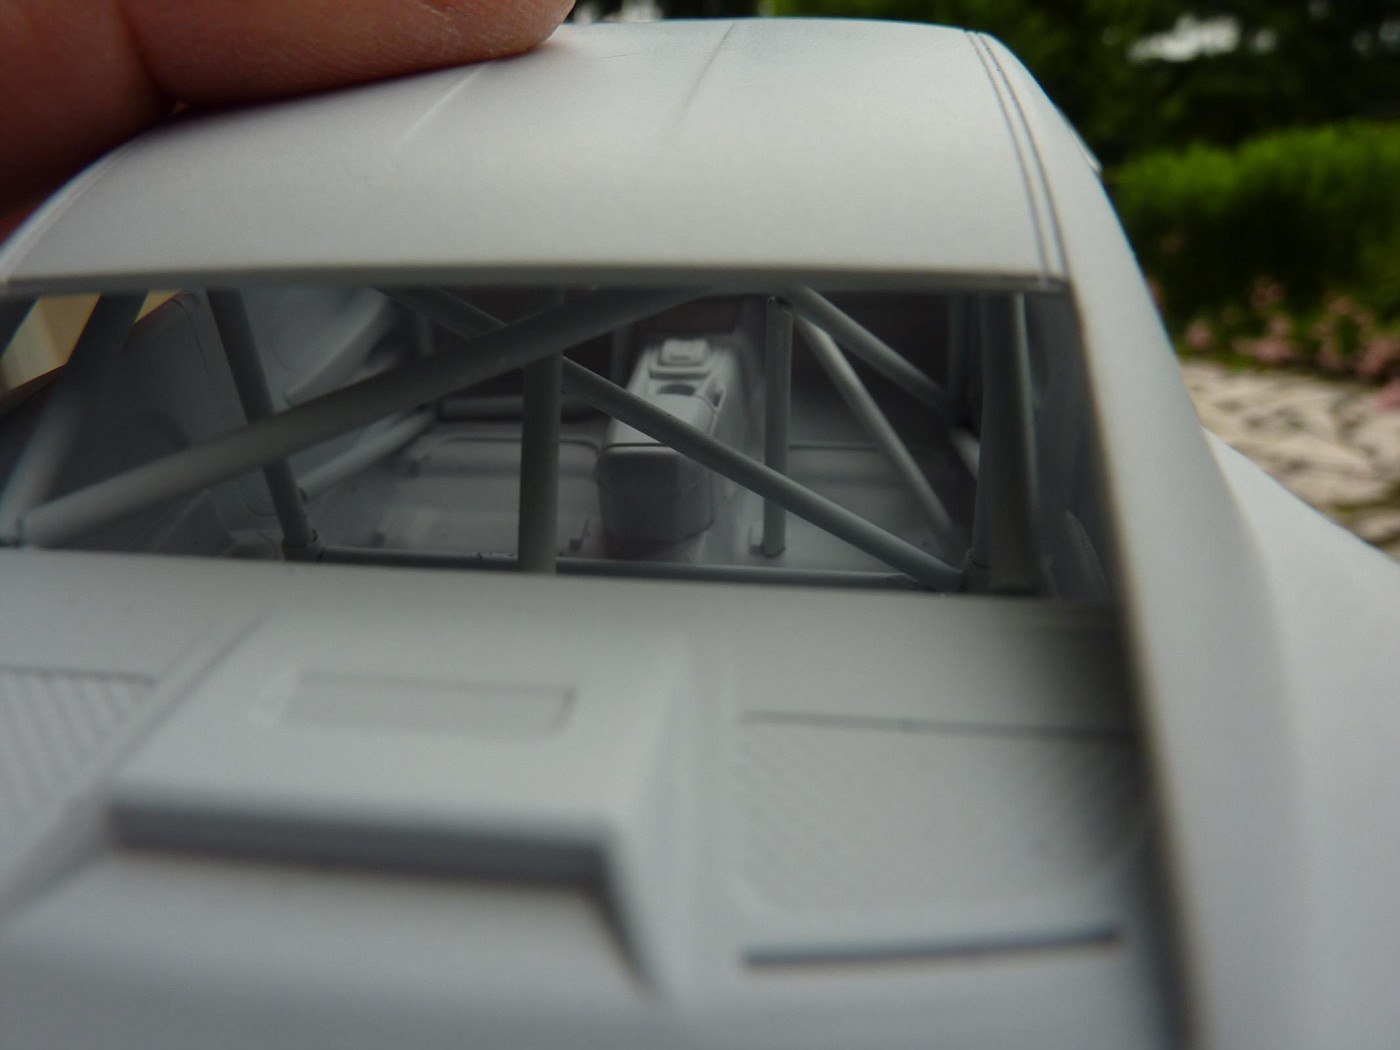 Camaro ALMS racing términée  Photo1-vi